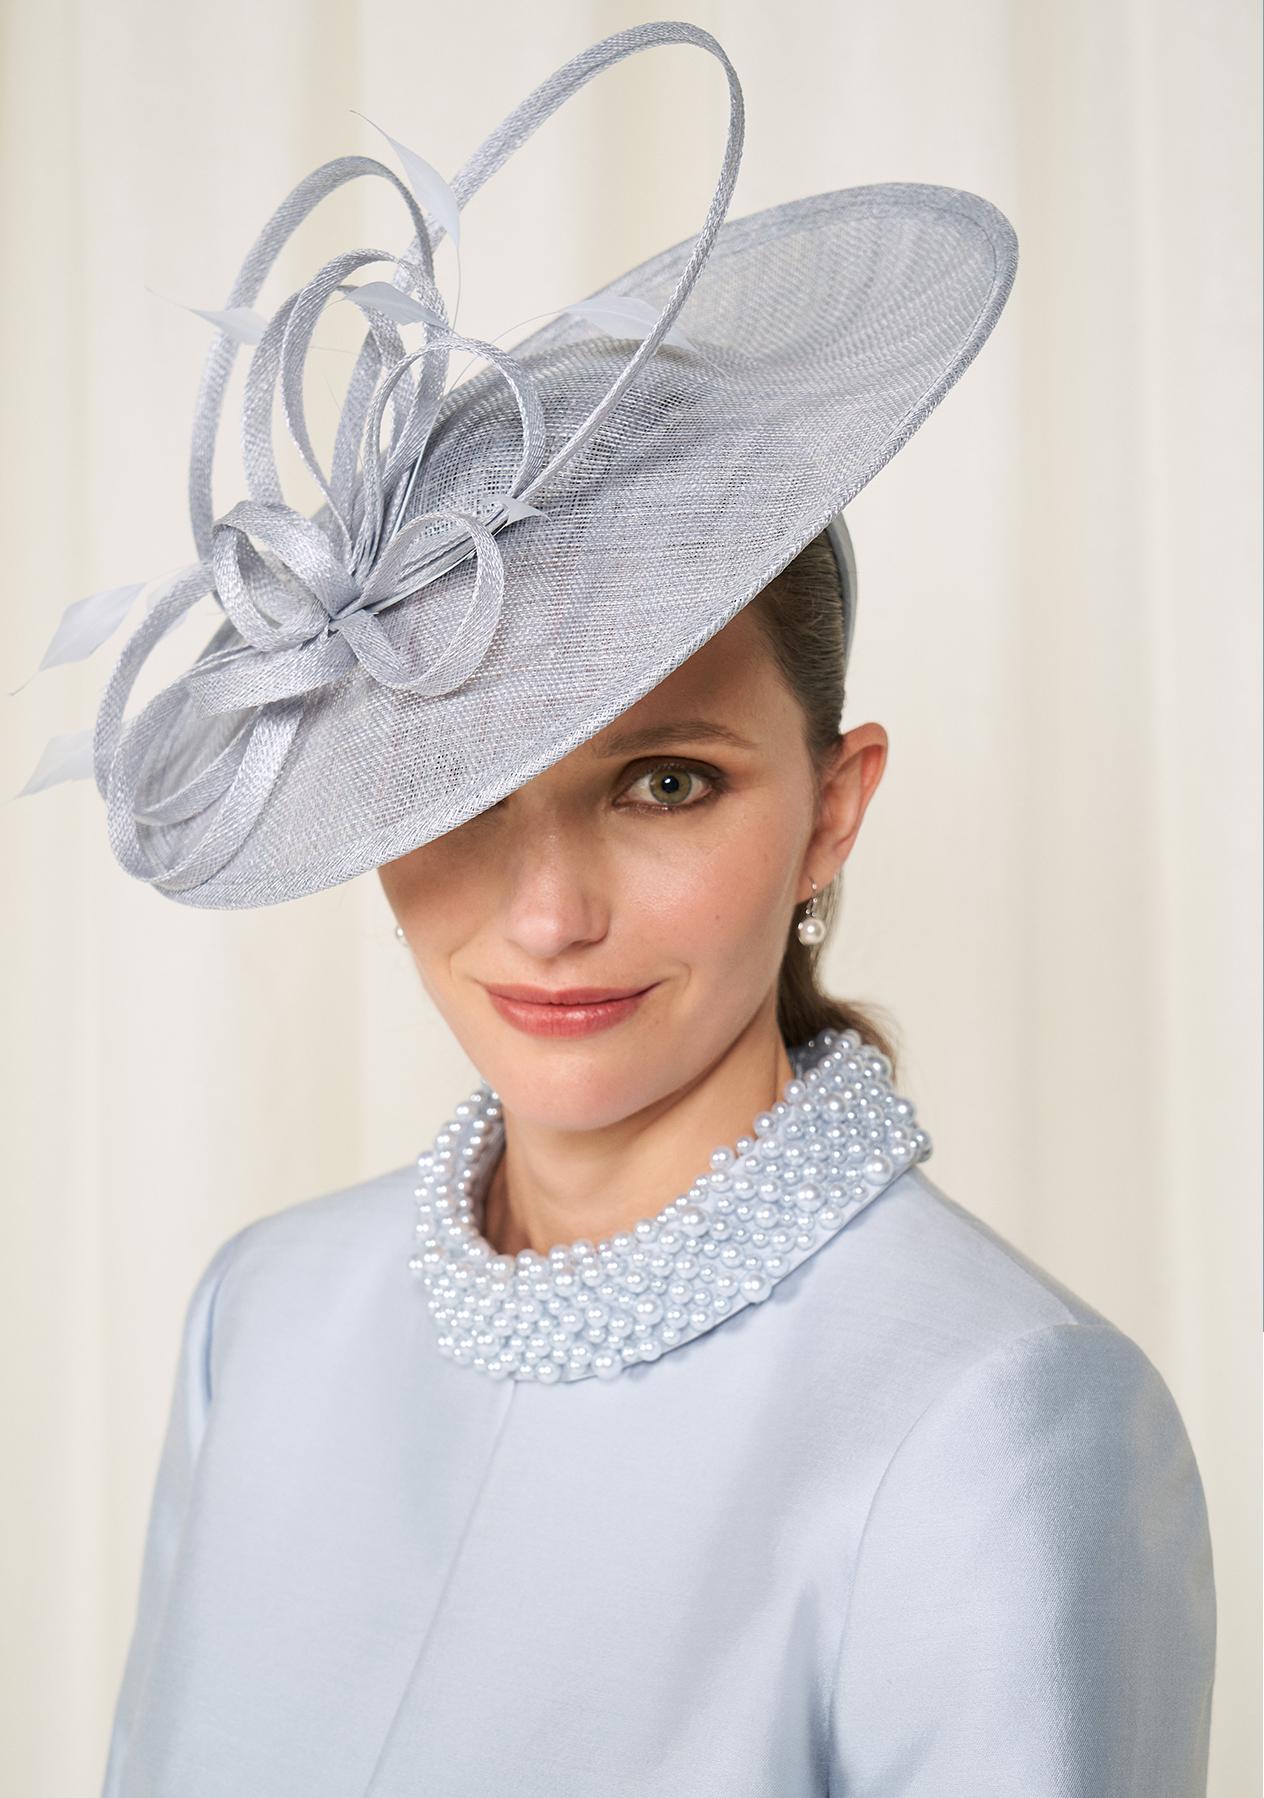 Model wears an embellished dress and fascinator.